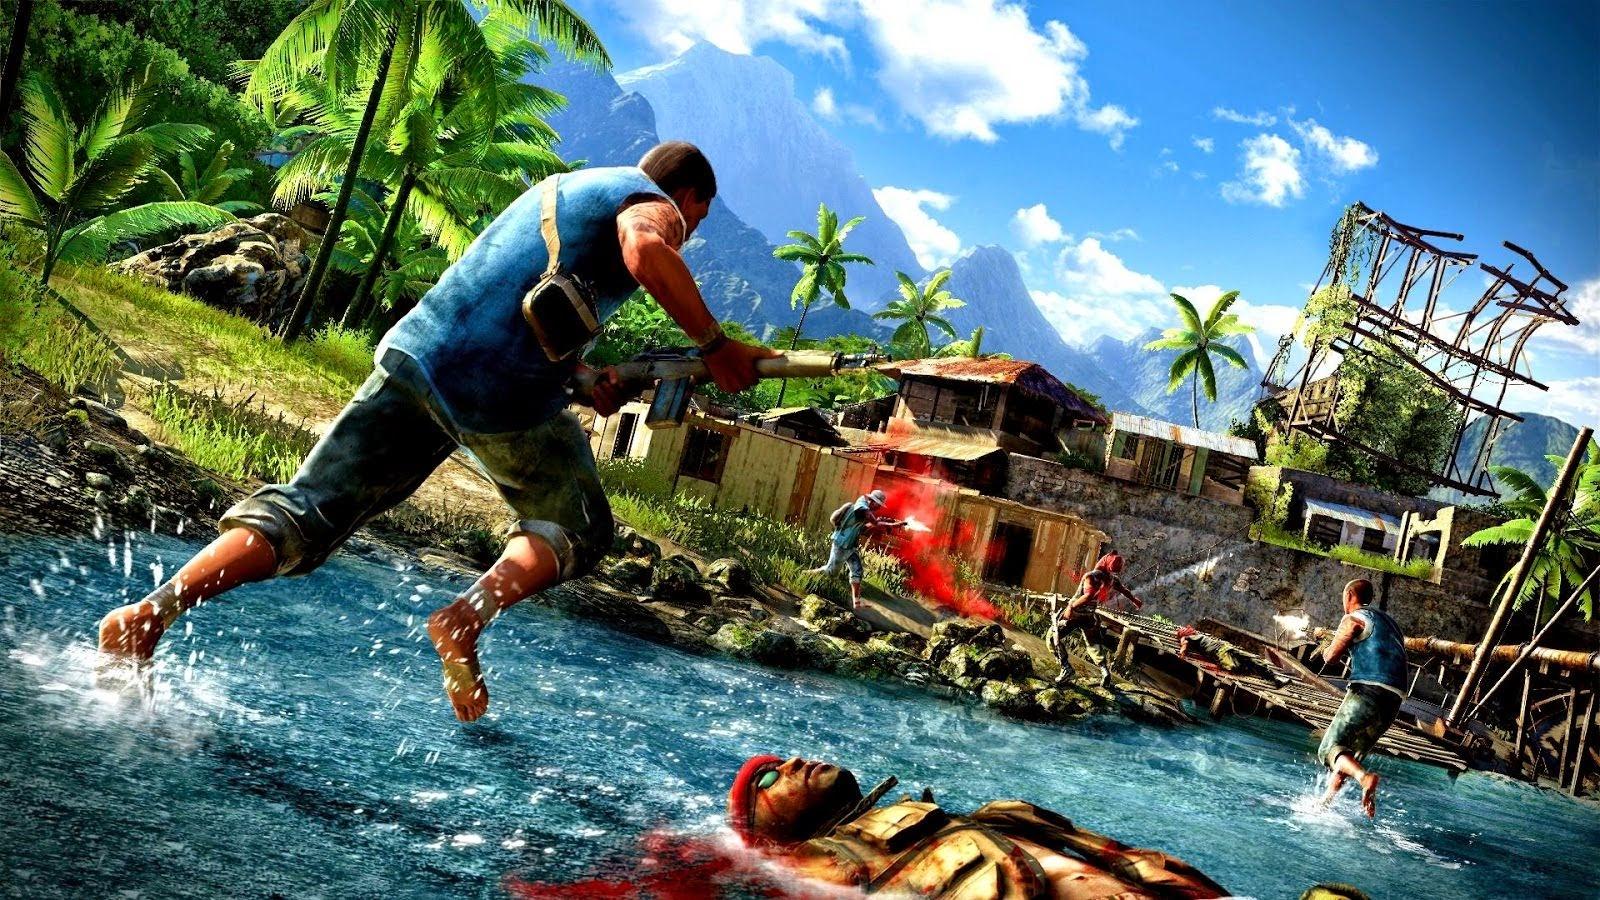 Far Cry 4 Wallpaper HD